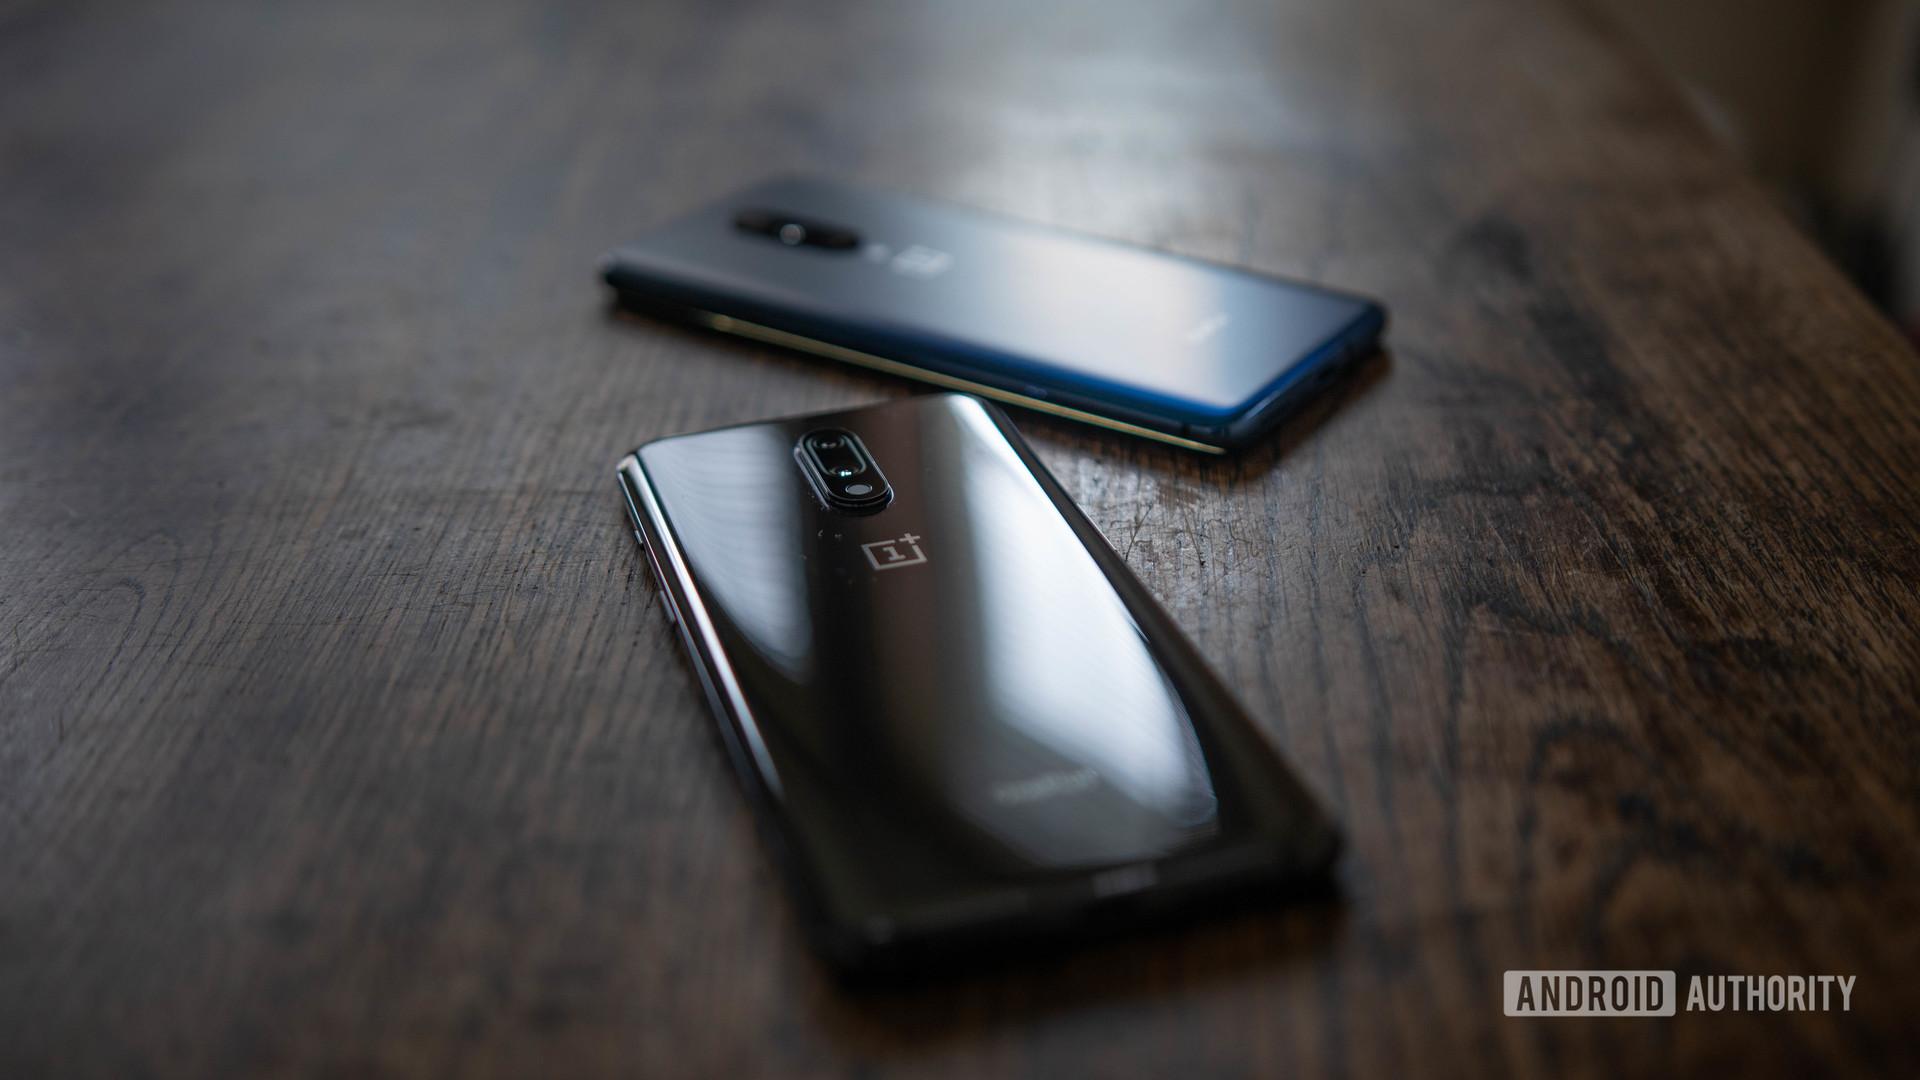 OnePlus 7 mirror gray back and OnePlus 7 Pro nubula blue